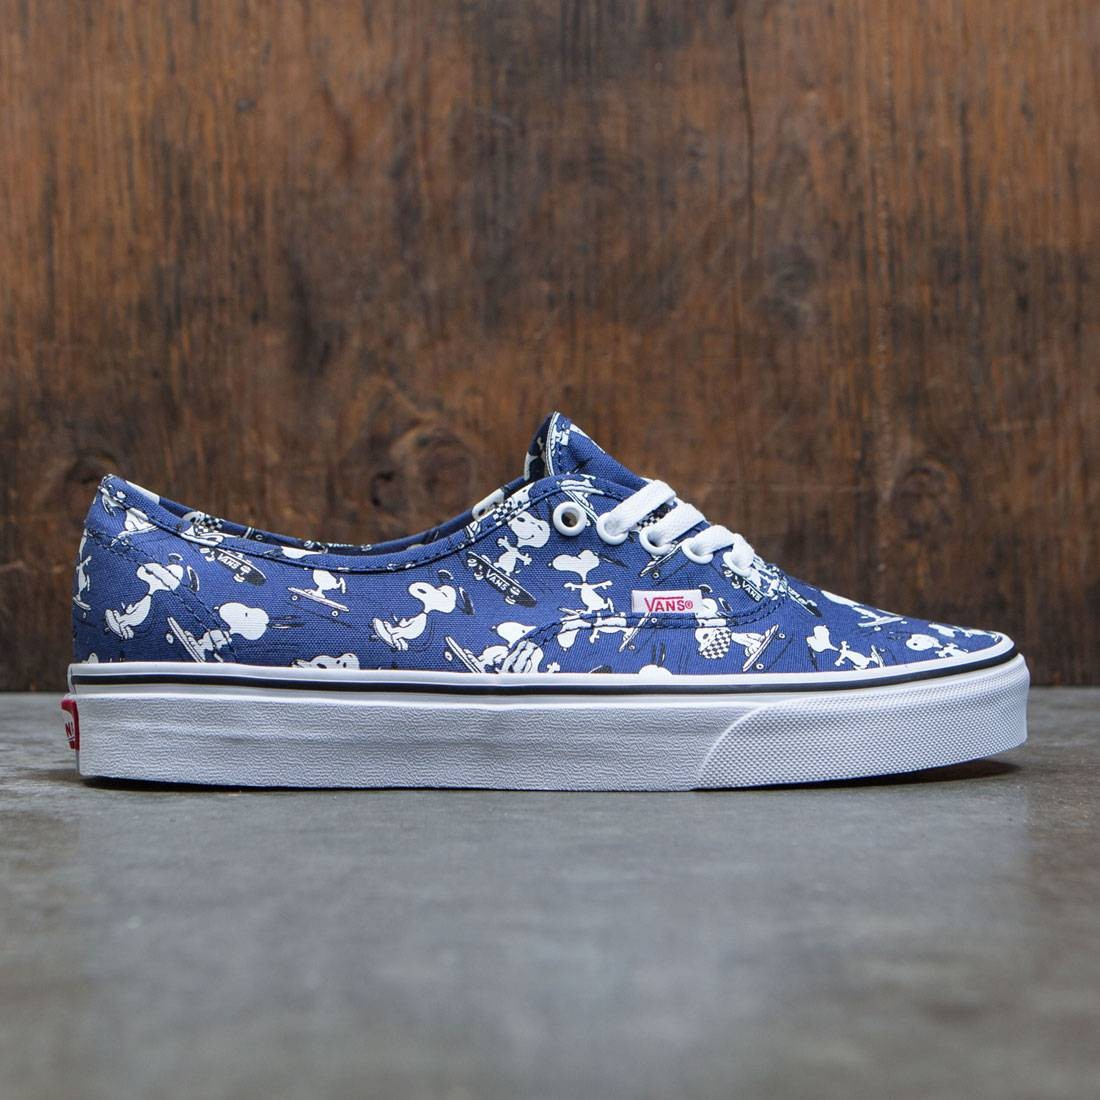 Vans x Peanuts Men Authentic - Snoopy Skating (blue)